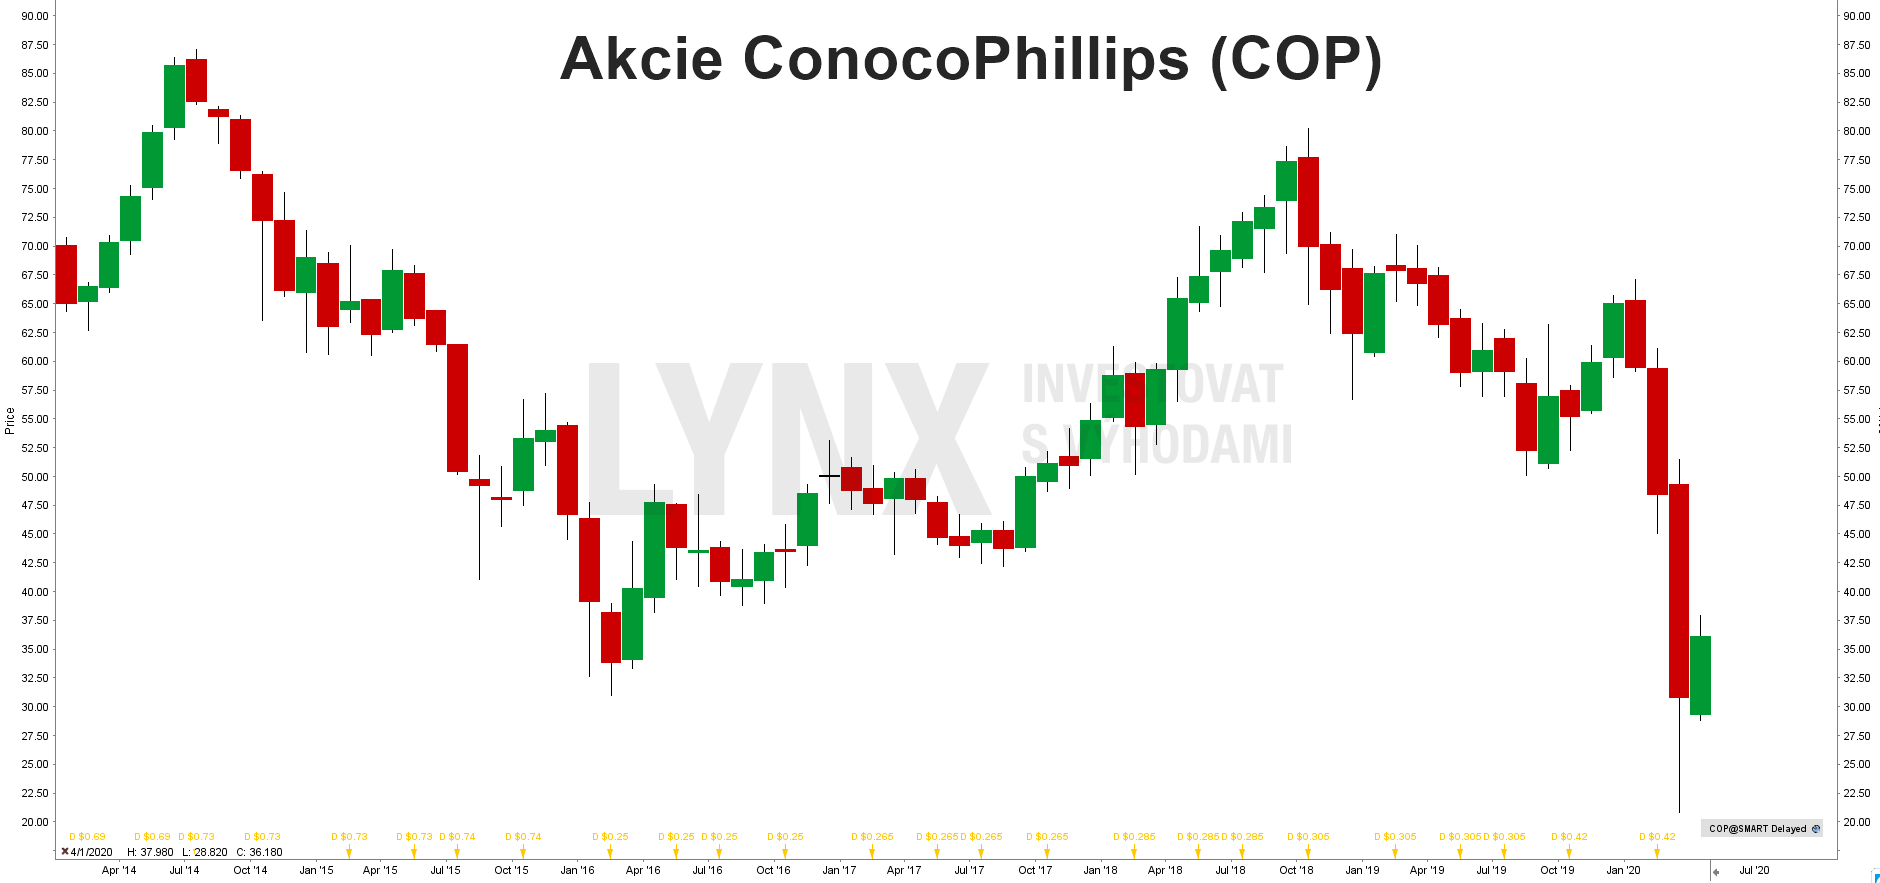 Akcie ConocoPhillips (COP)